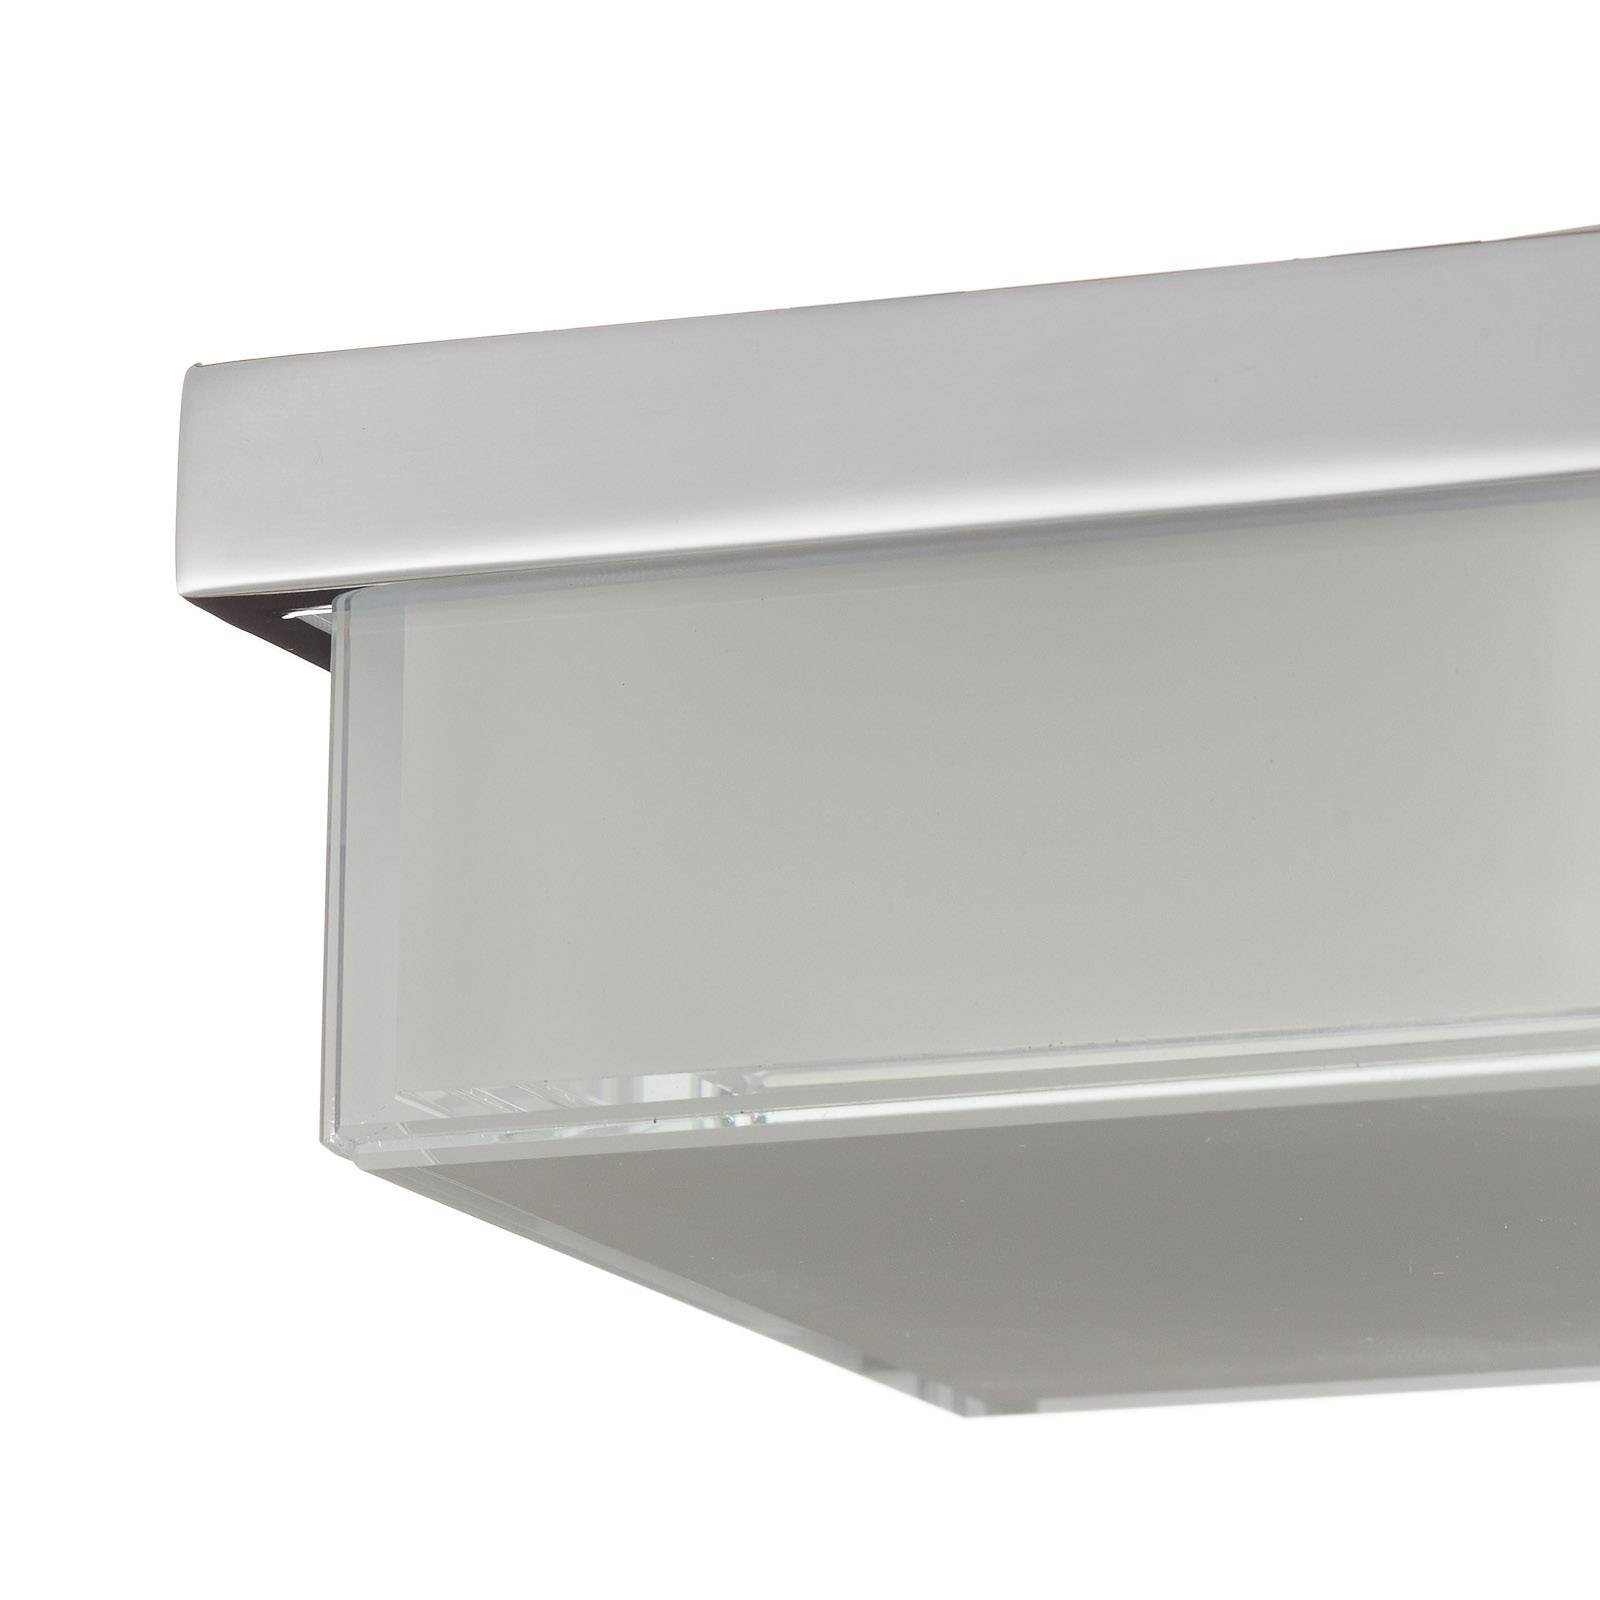 Helestra Cosi LED-taklampe, krom, 11x11 cm